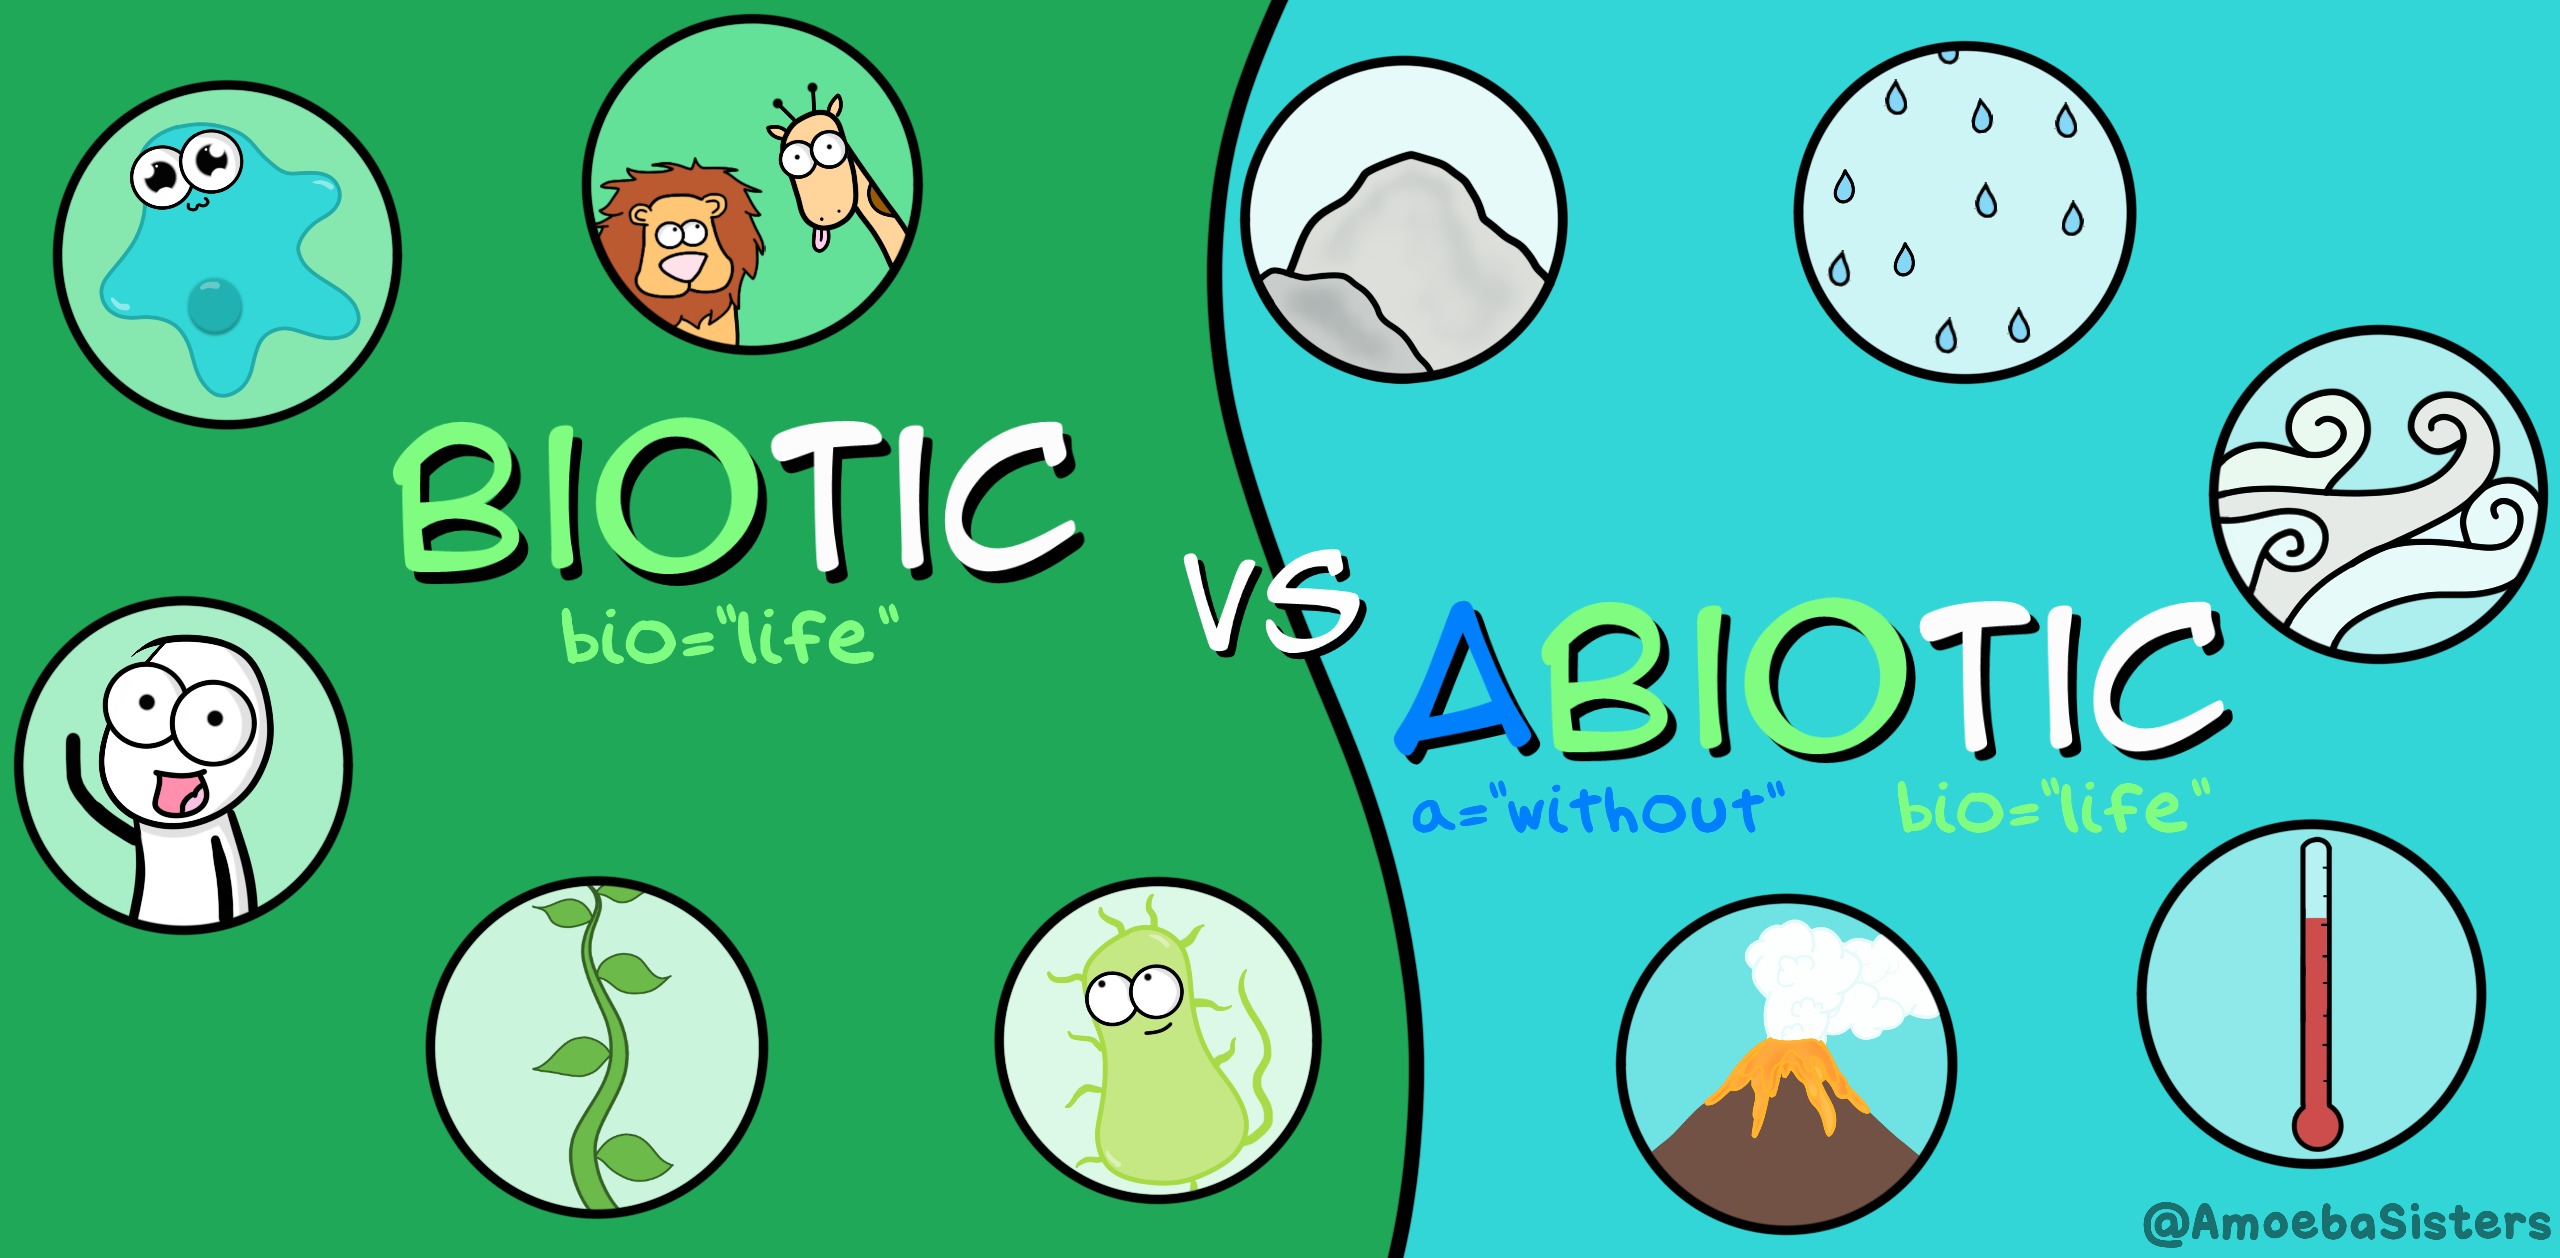 Biotic Vs Abiotic Factors I Biology I The Amoeba Sisters Abiotic Biology Lessons Life Science